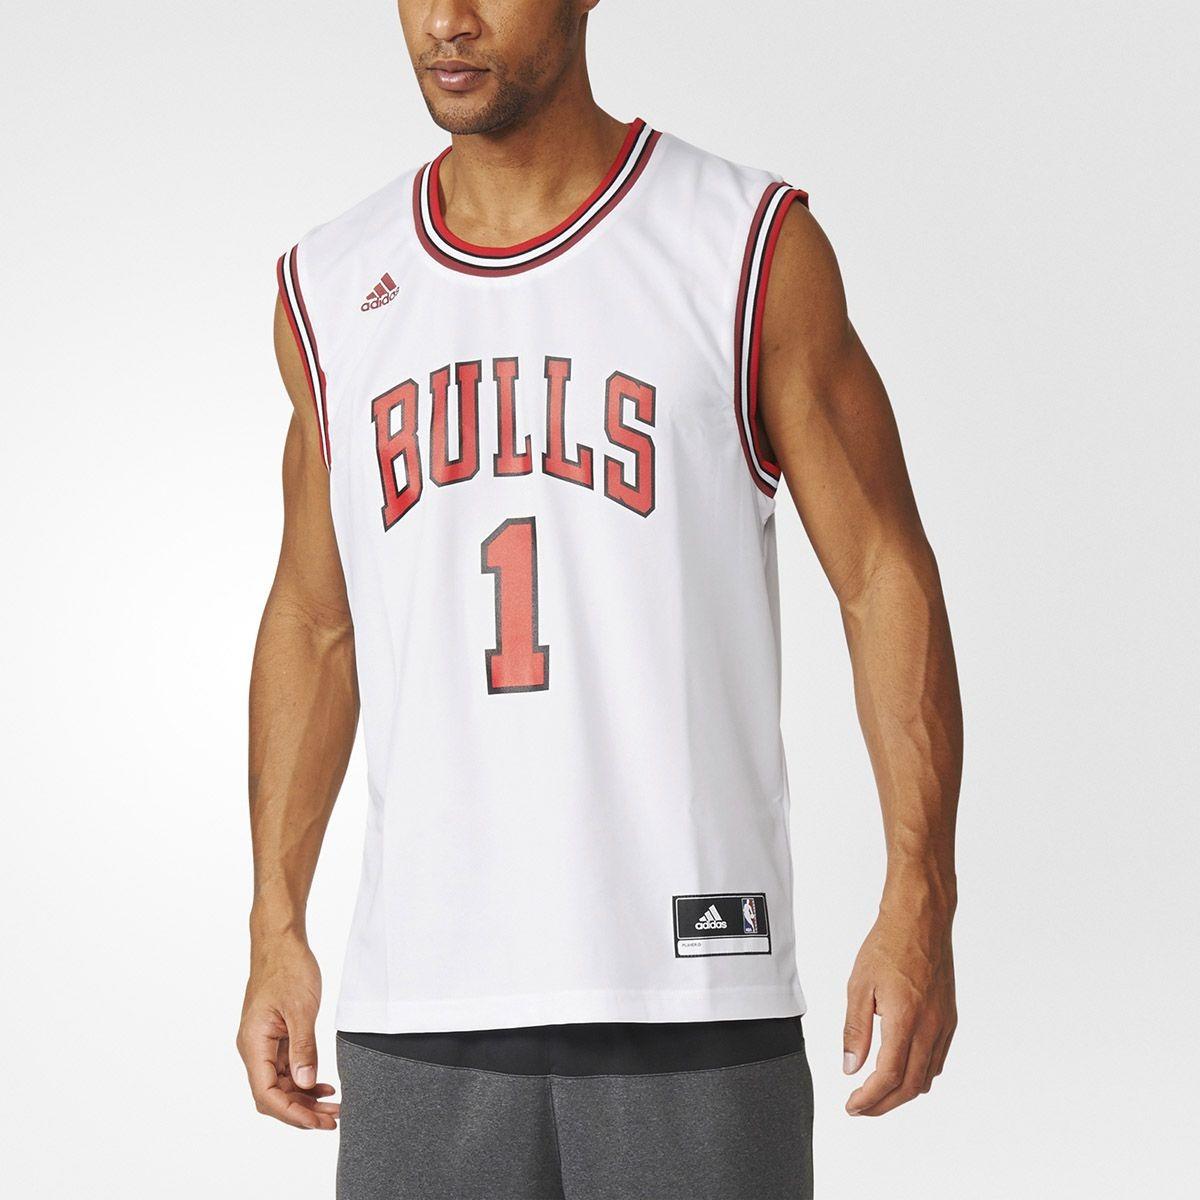 c471ef0c25 Camisa Regata adidas Nba Chigaco Bulls Nº1 Rose Original Cnf - R  120